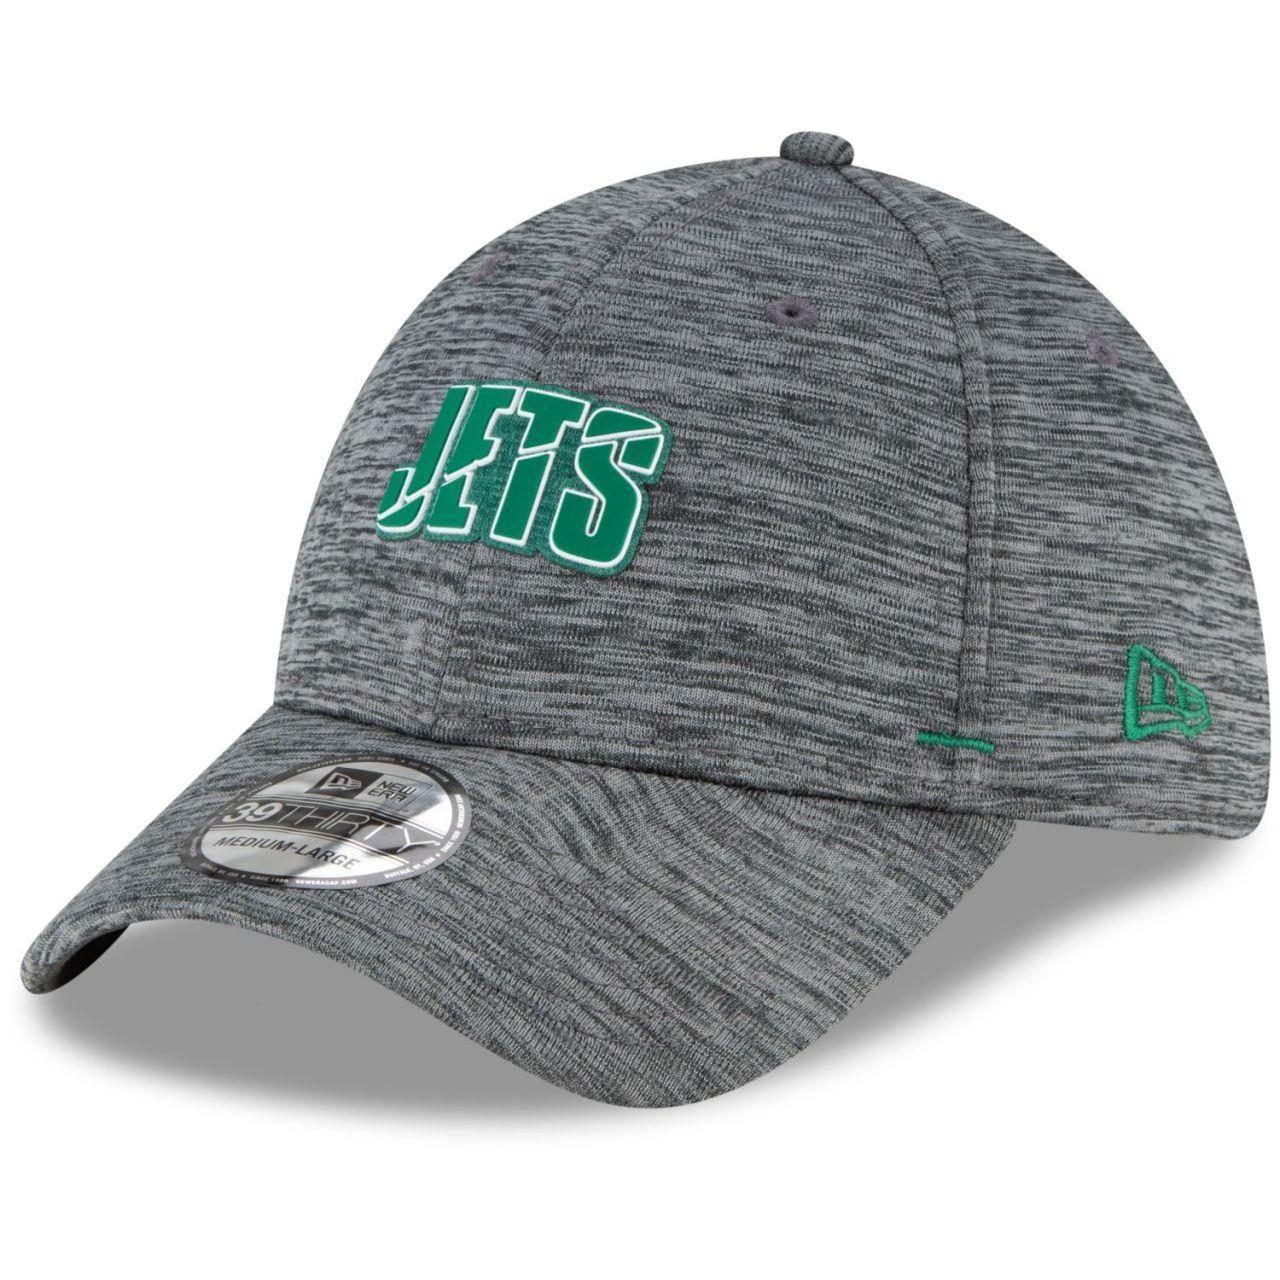 amfoo - New Era 39Thirty Cap - NFL CAMP New York Jets